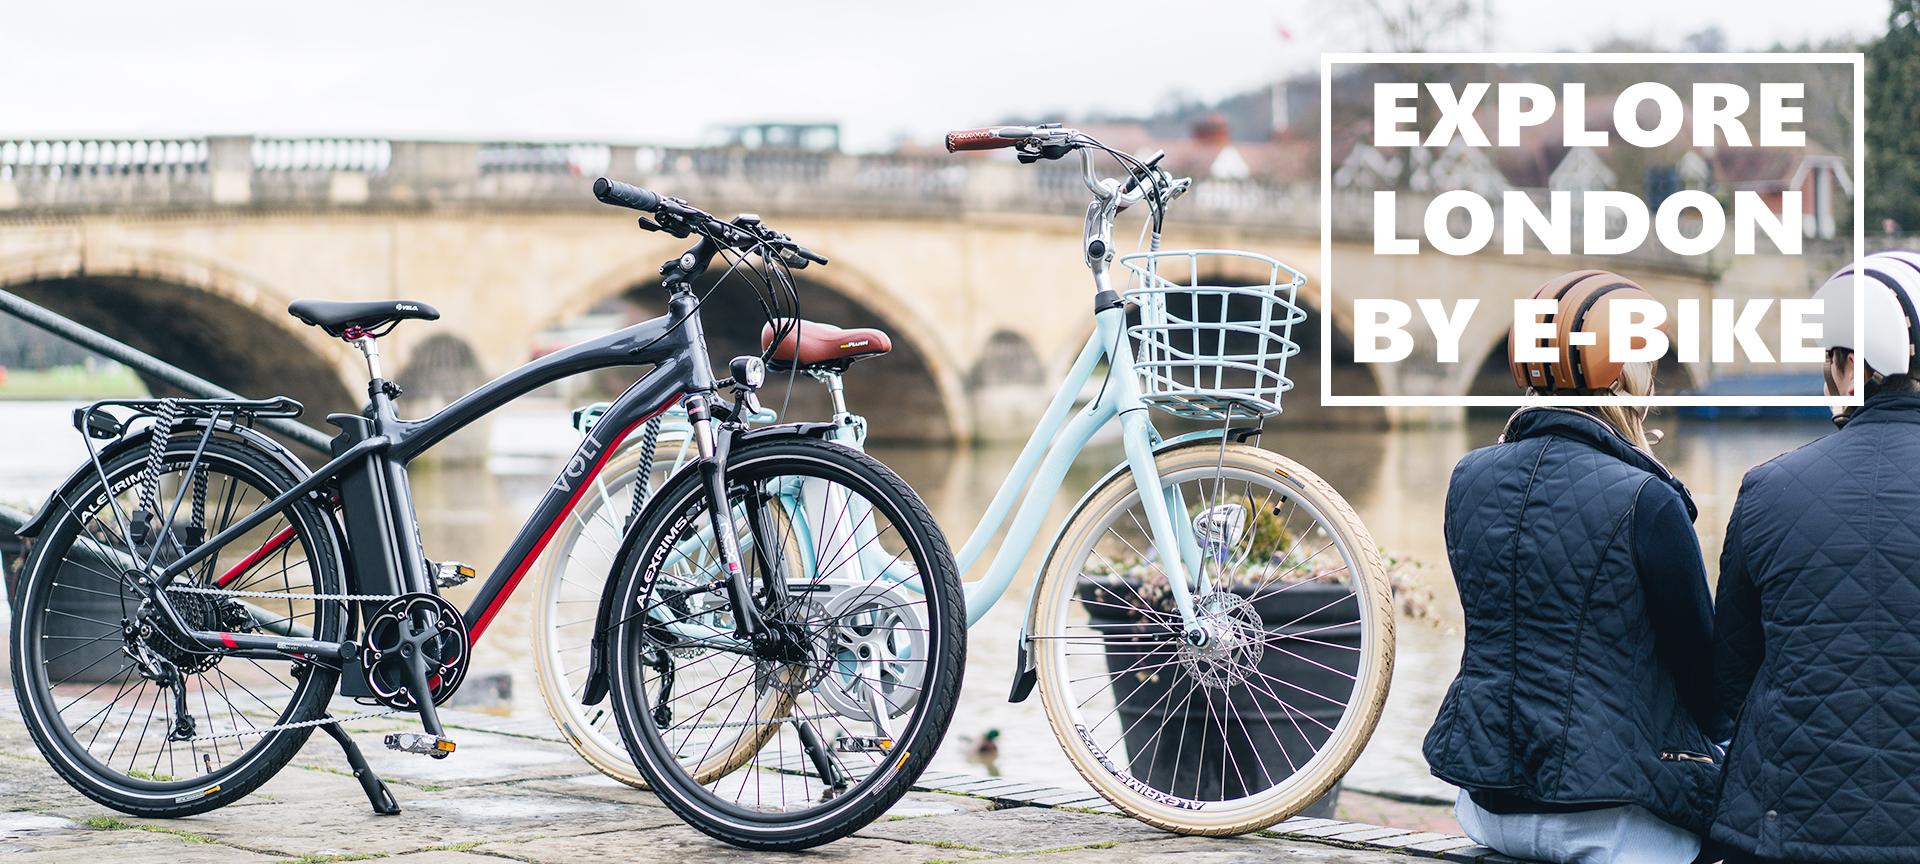 couple-riding-electric-bikes-through-the-suburbs